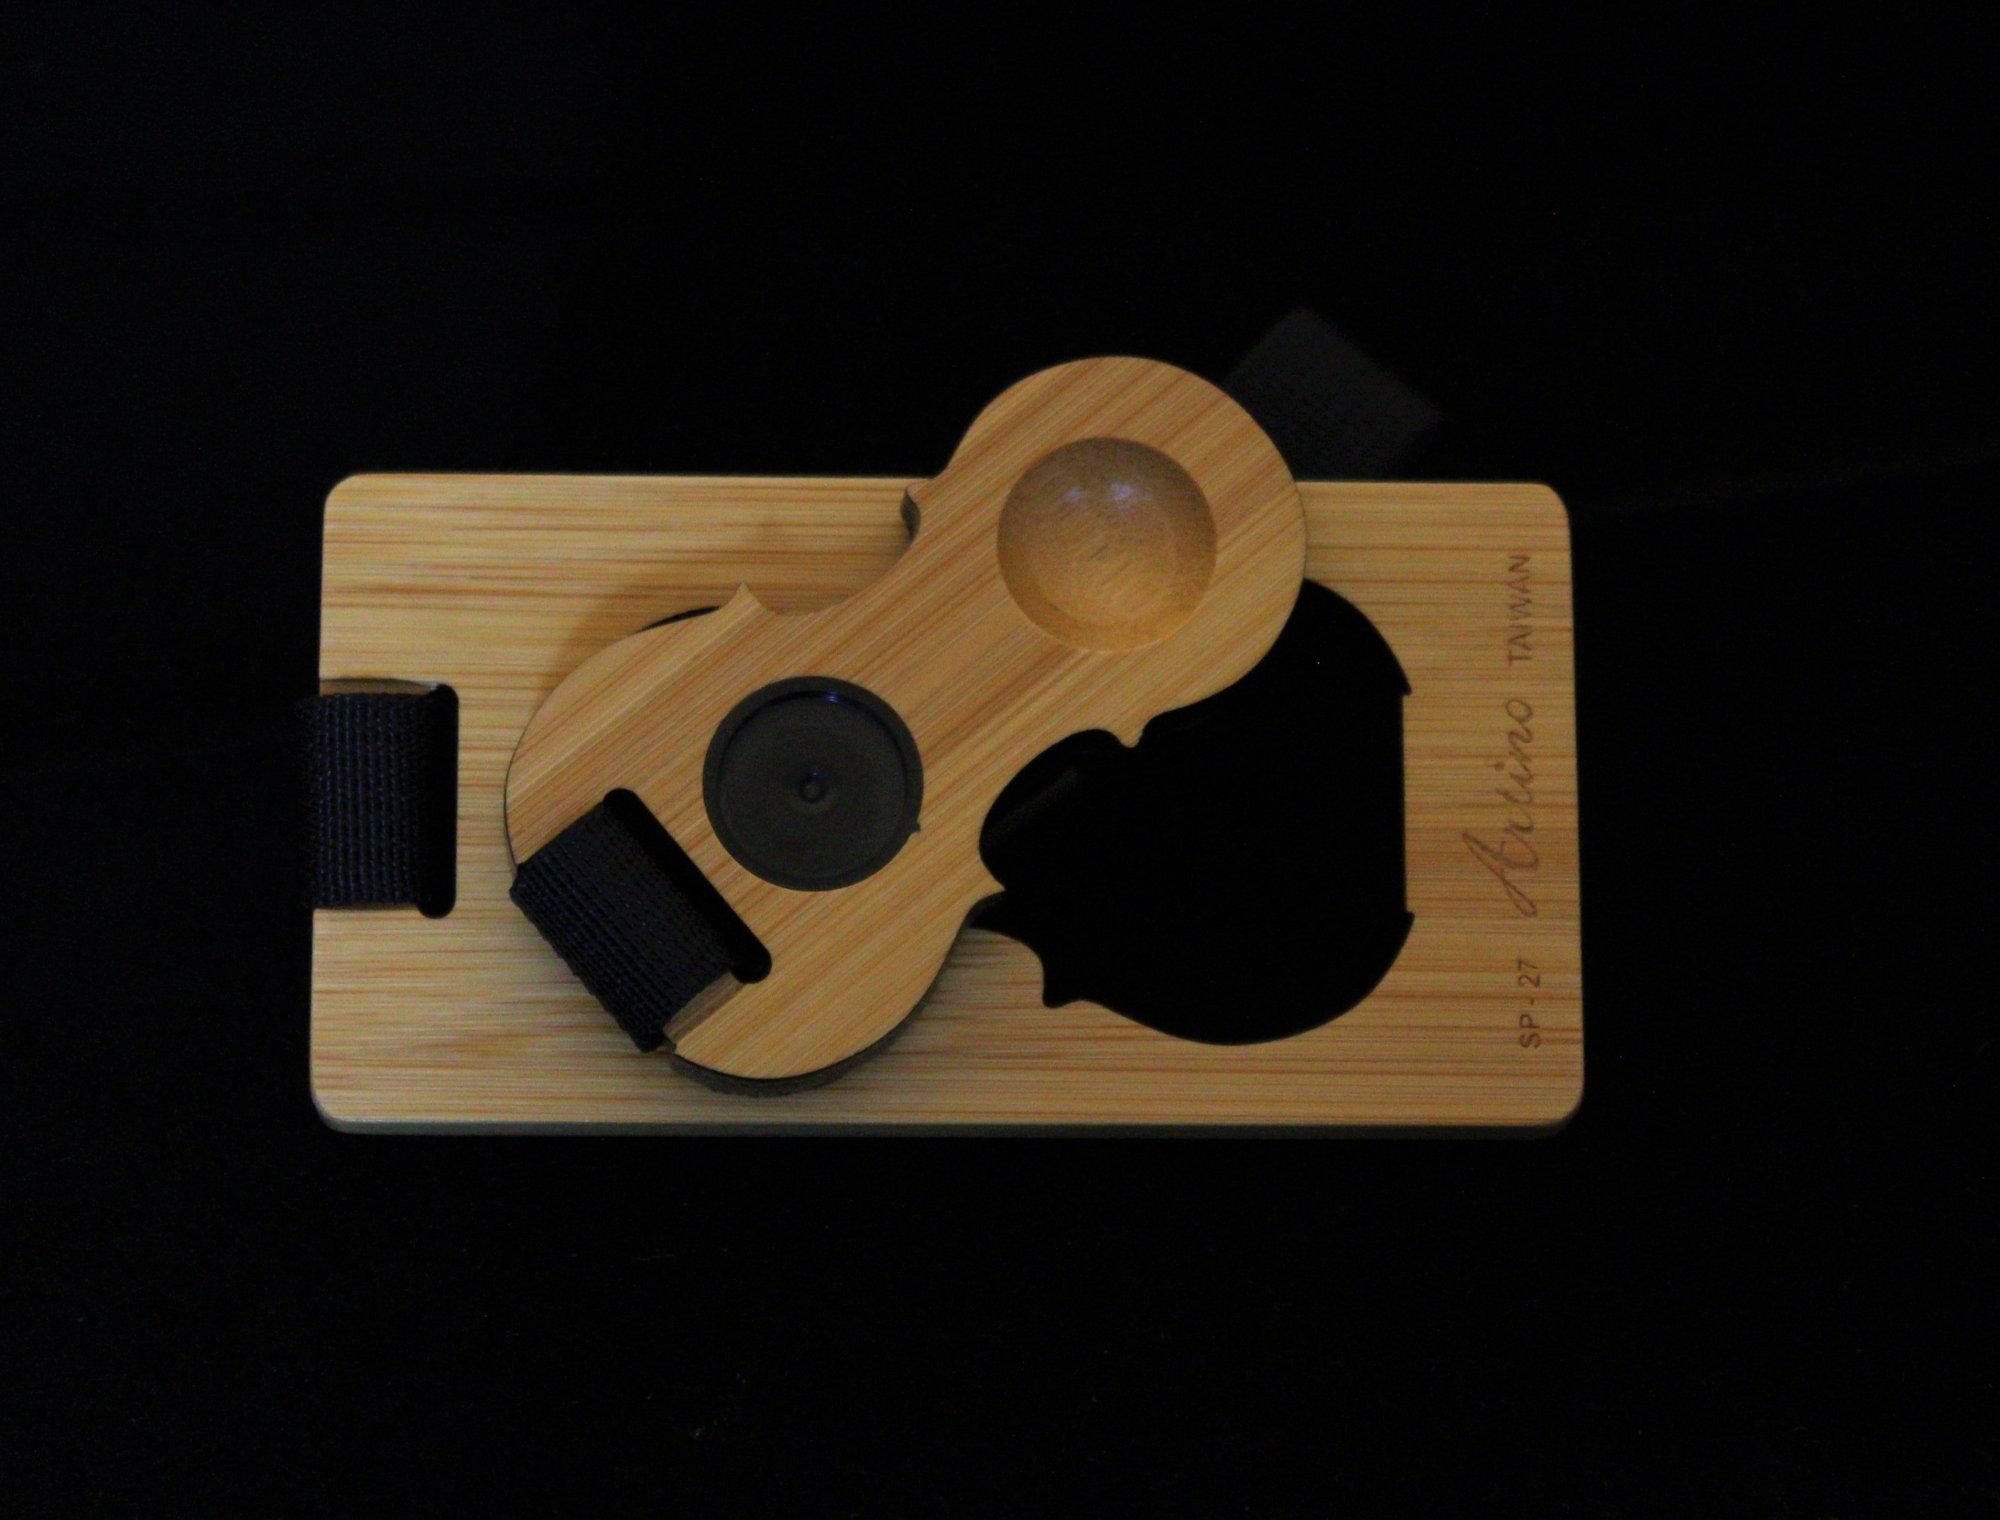 Artino Compact Bamboo Cello Rockstop w/ Adjustable Strap